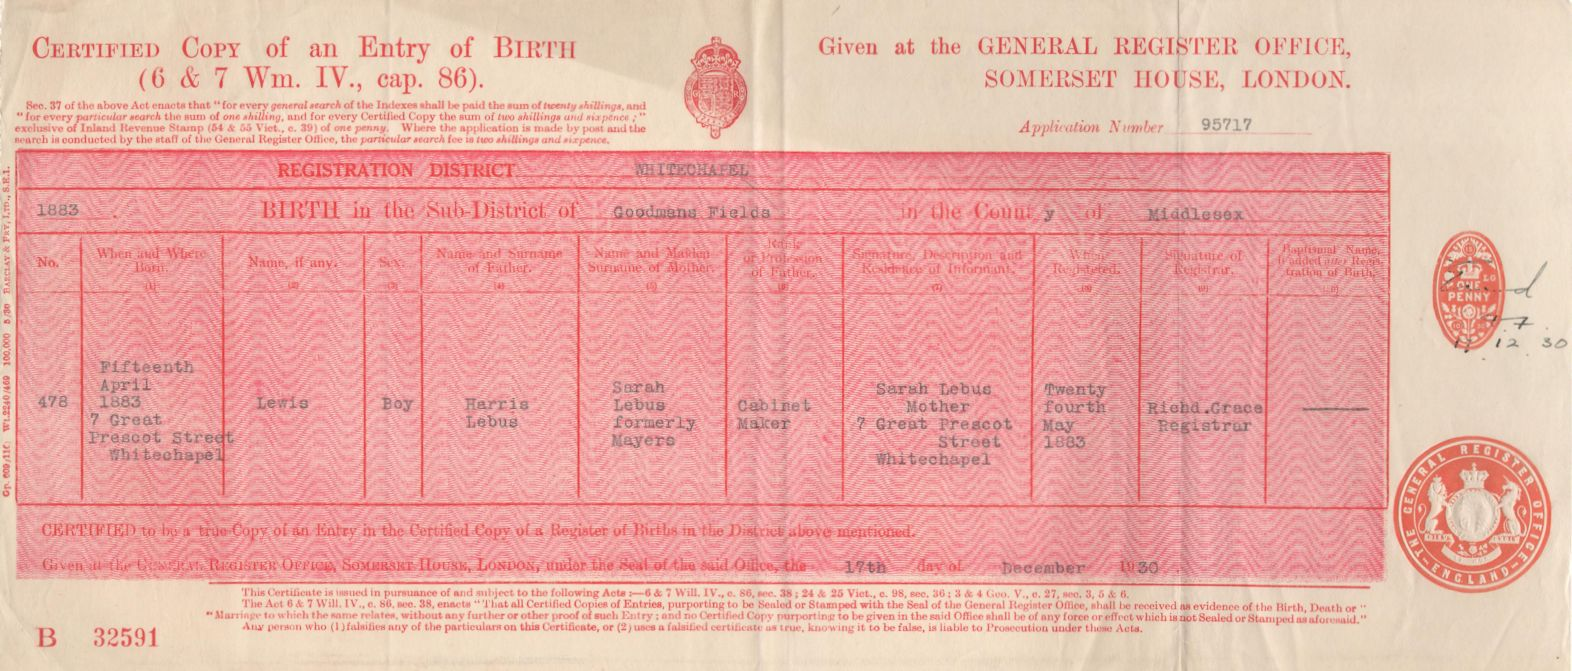 Miscellaneous harris lebus harris lebus birth certificate 1883 aiddatafo Choice Image